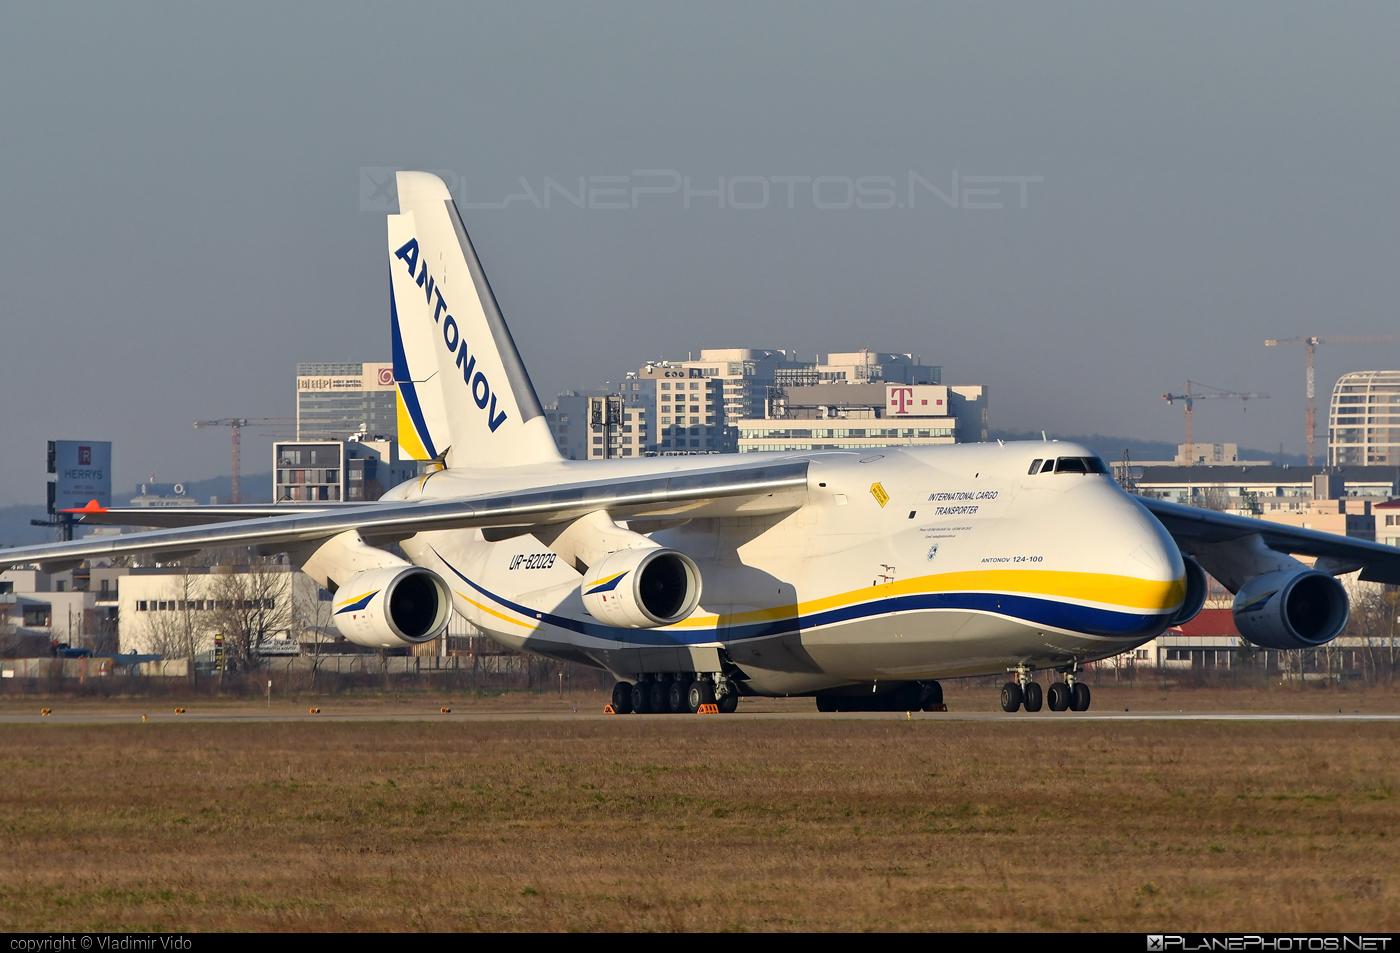 Antonov An-124-100 Ruslan - UR-82029 operated by Antonov Airlines #an124 #an124100 #antonov #antonov124 #ruslan